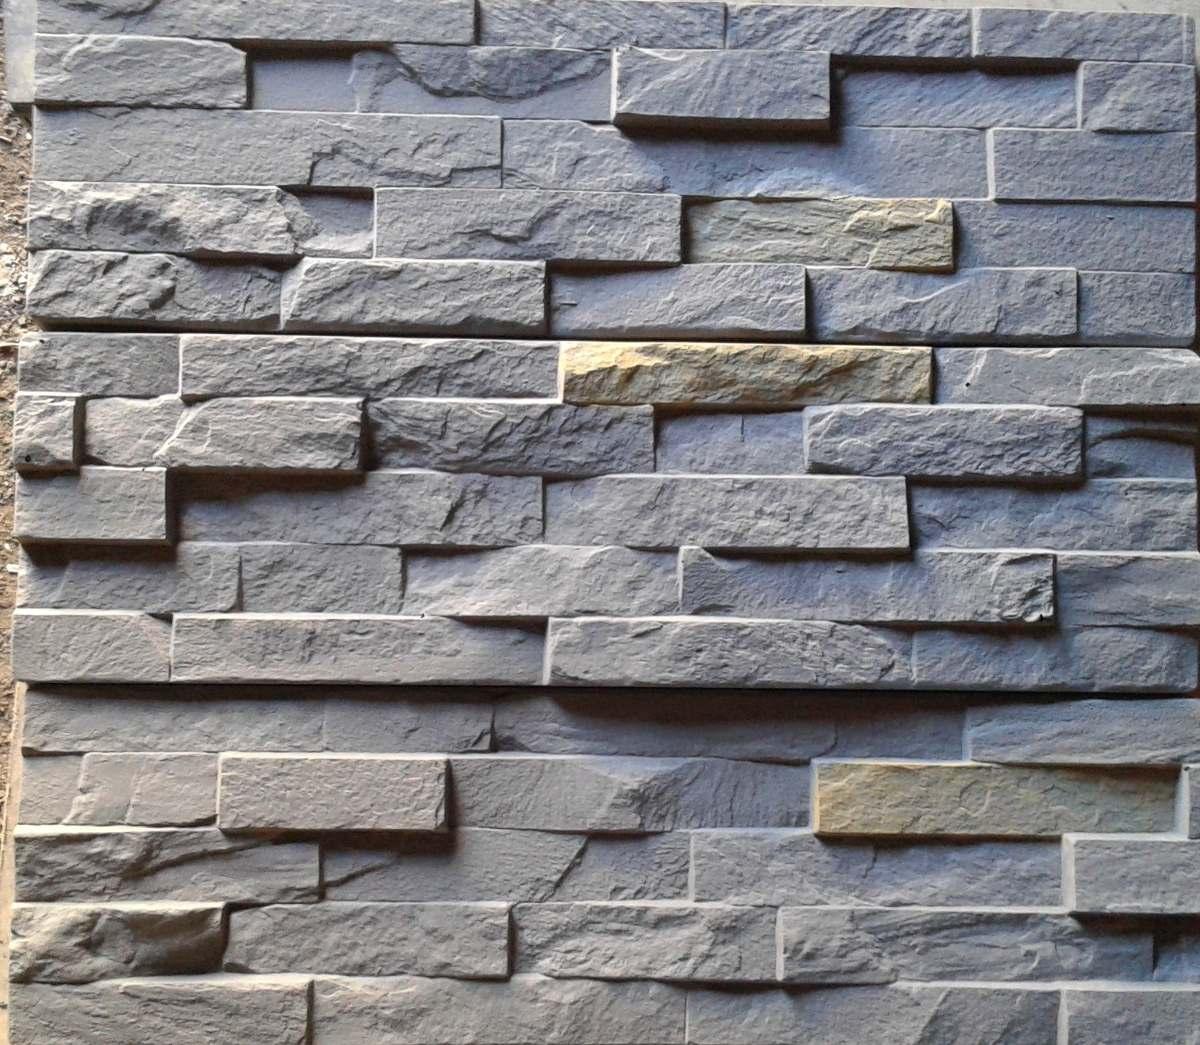 Baldosas De Piedra Texturas De La Pared De Baldosas De